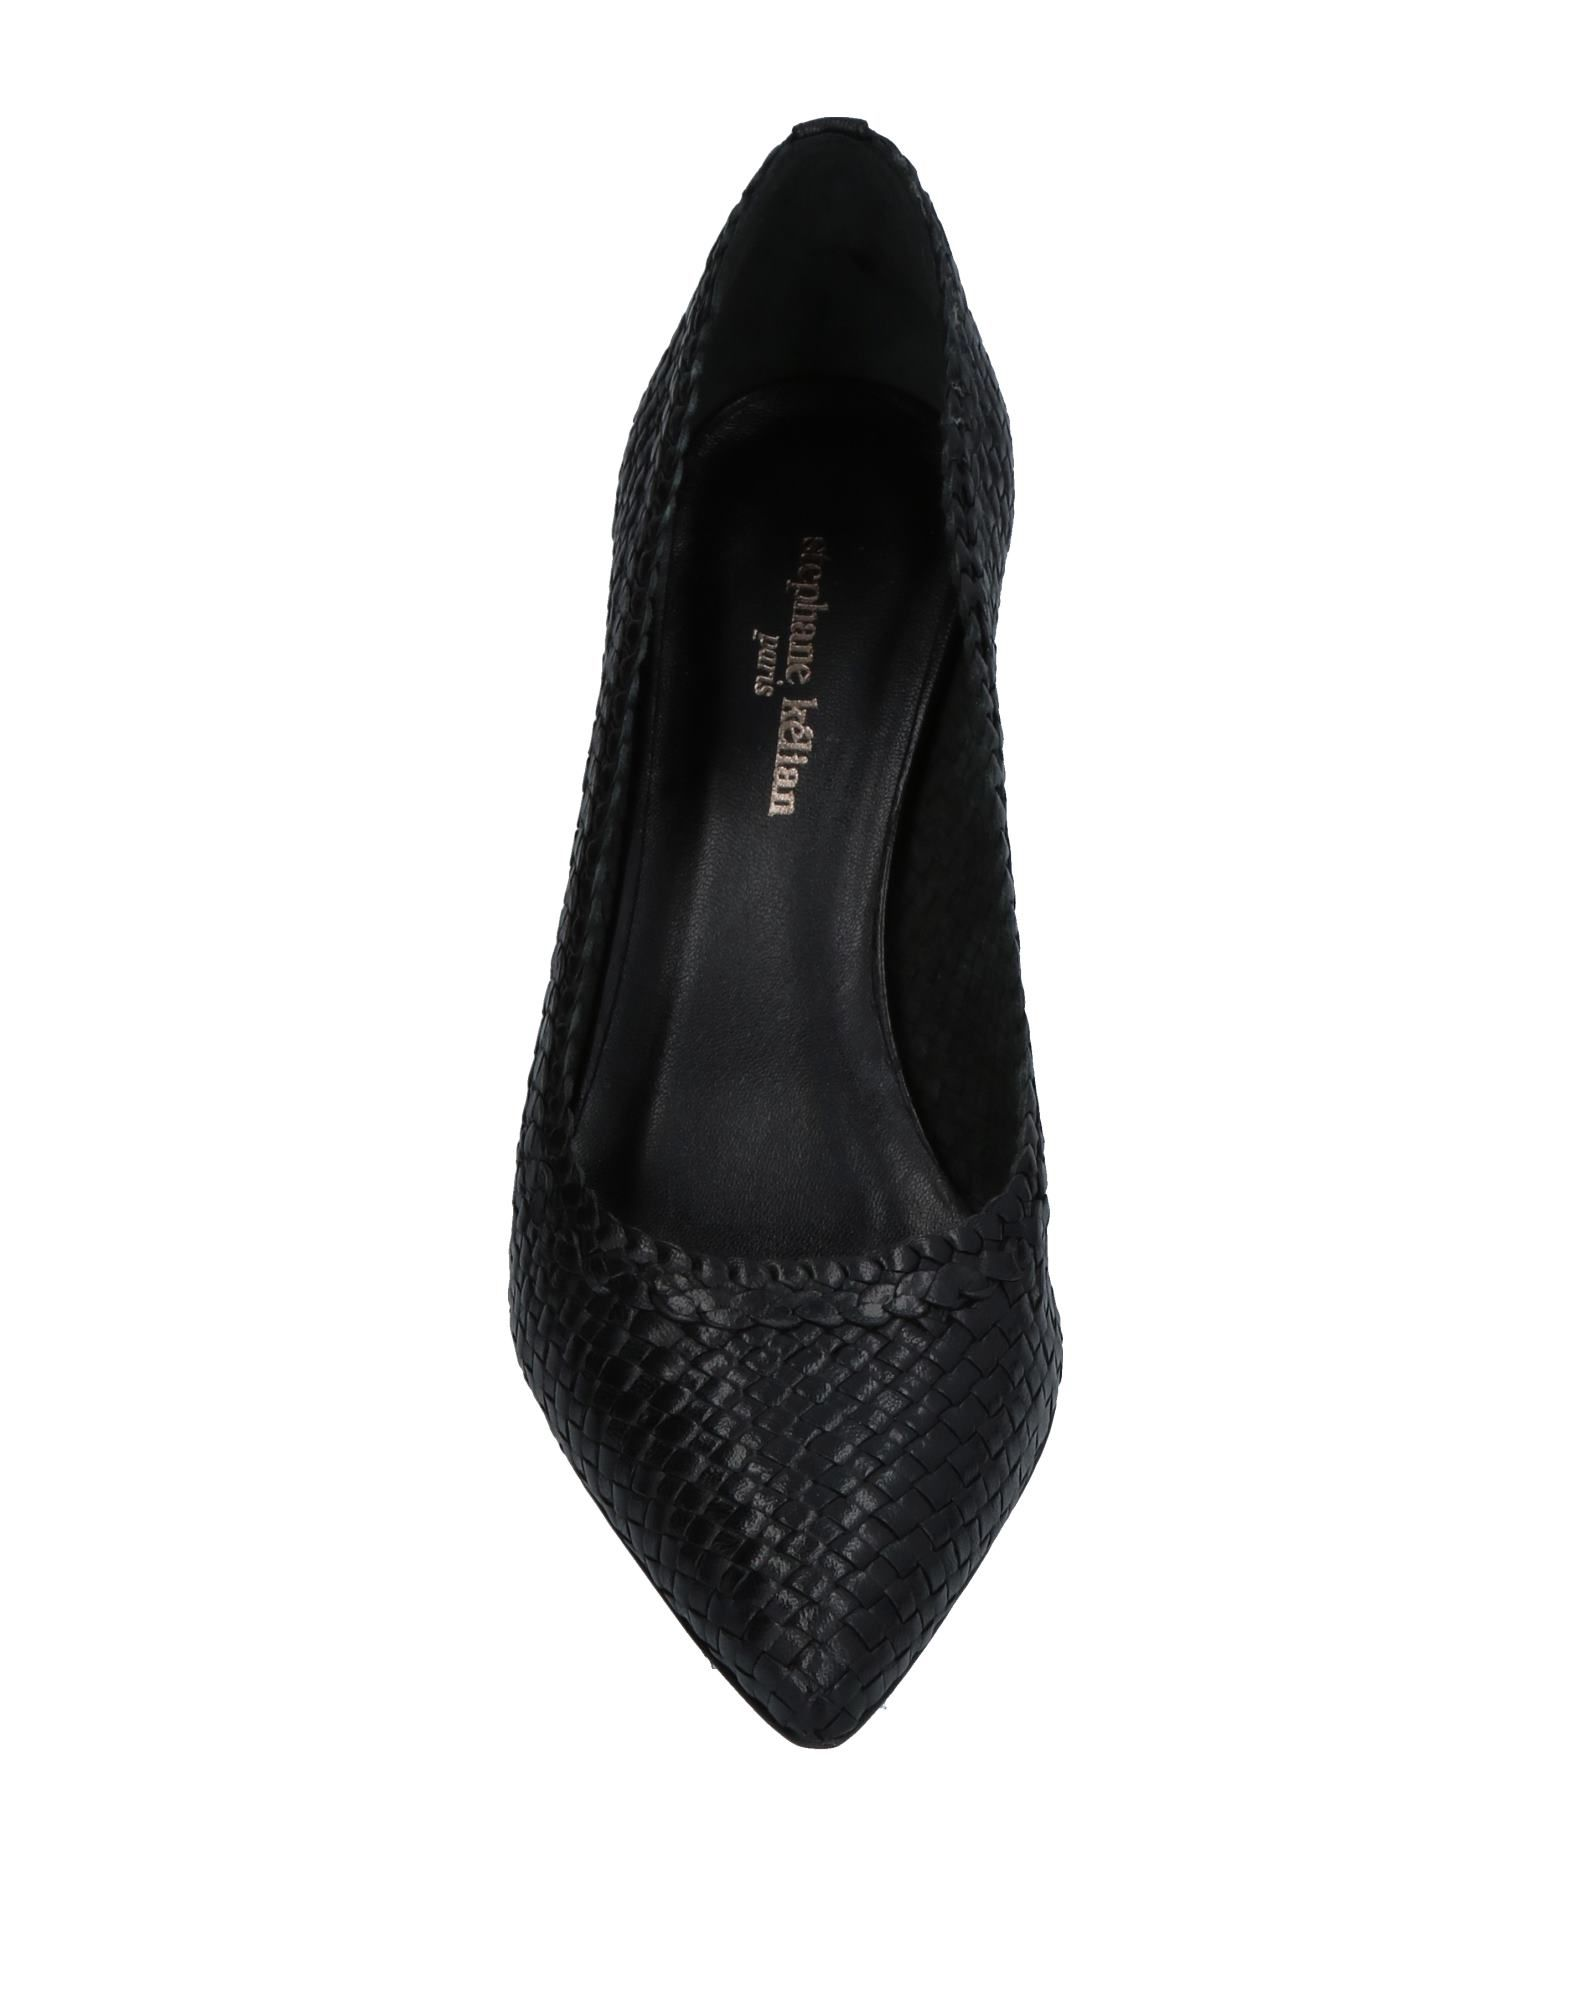 Stephane Kélian Pumps Damen strapazierfähige  11405077ULGut aussehende strapazierfähige Damen Schuhe c04aef